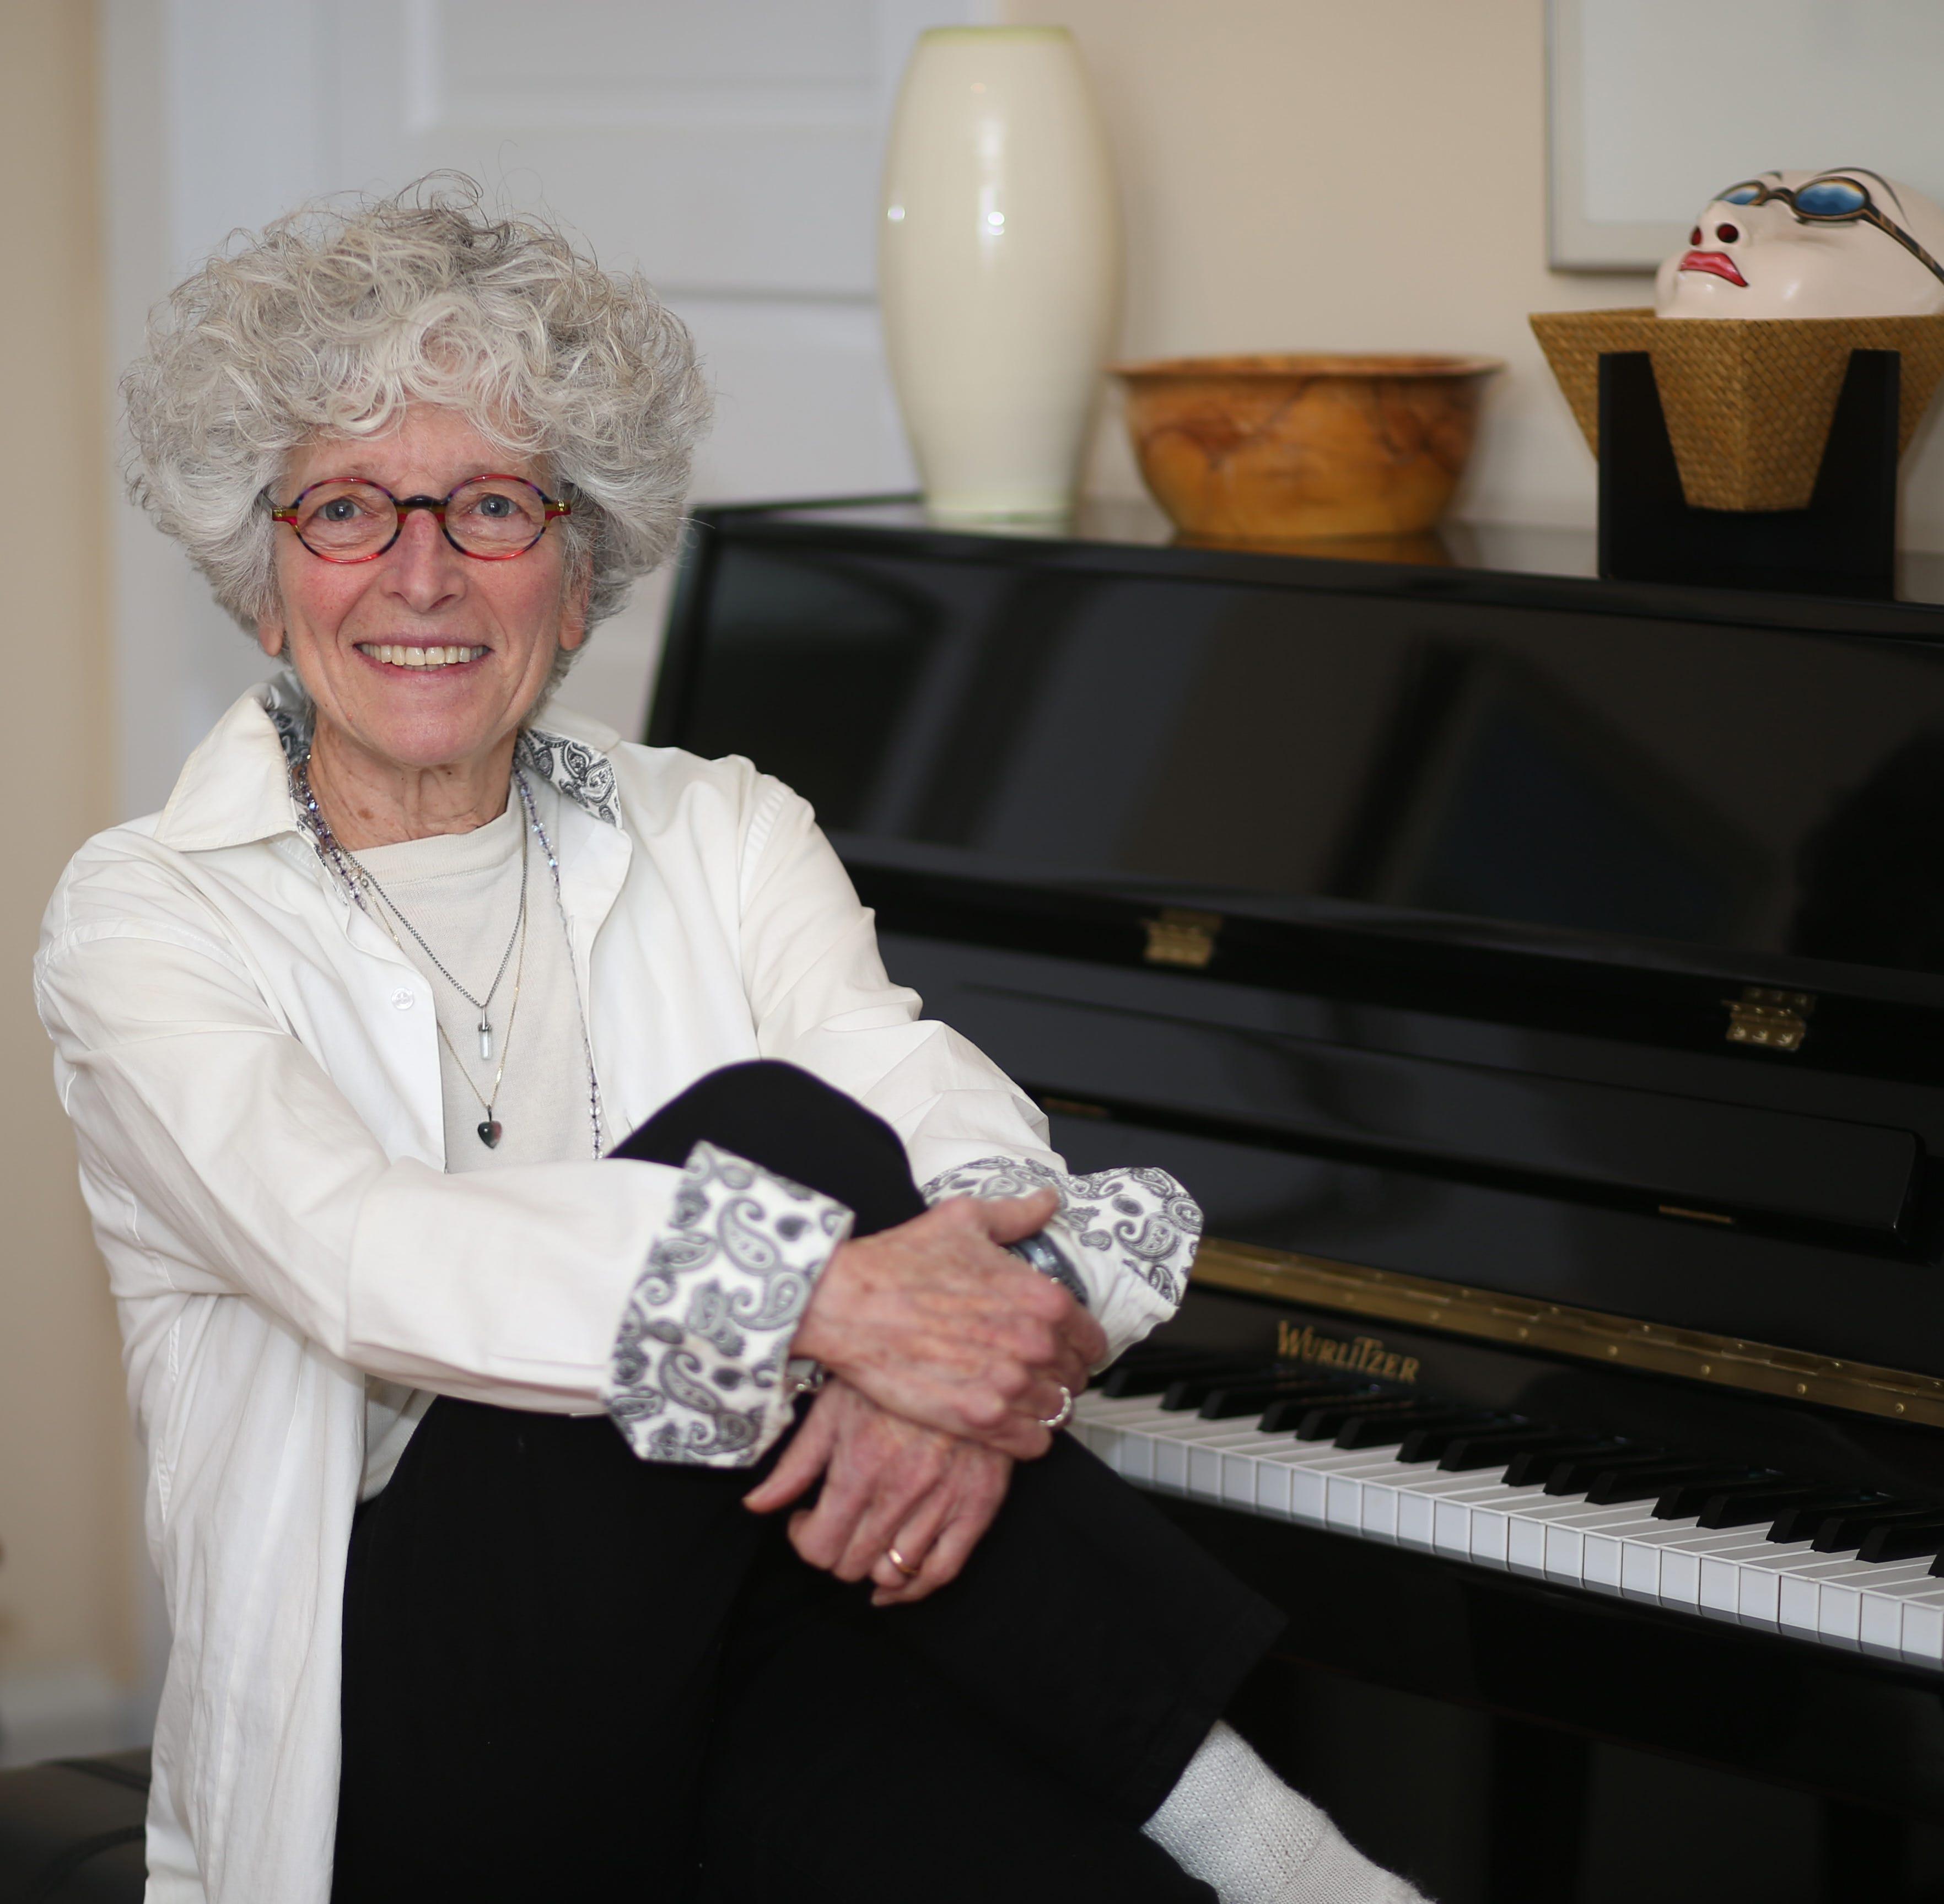 Music, television, opera: Milan's Lois Walden's star shines in multi medias